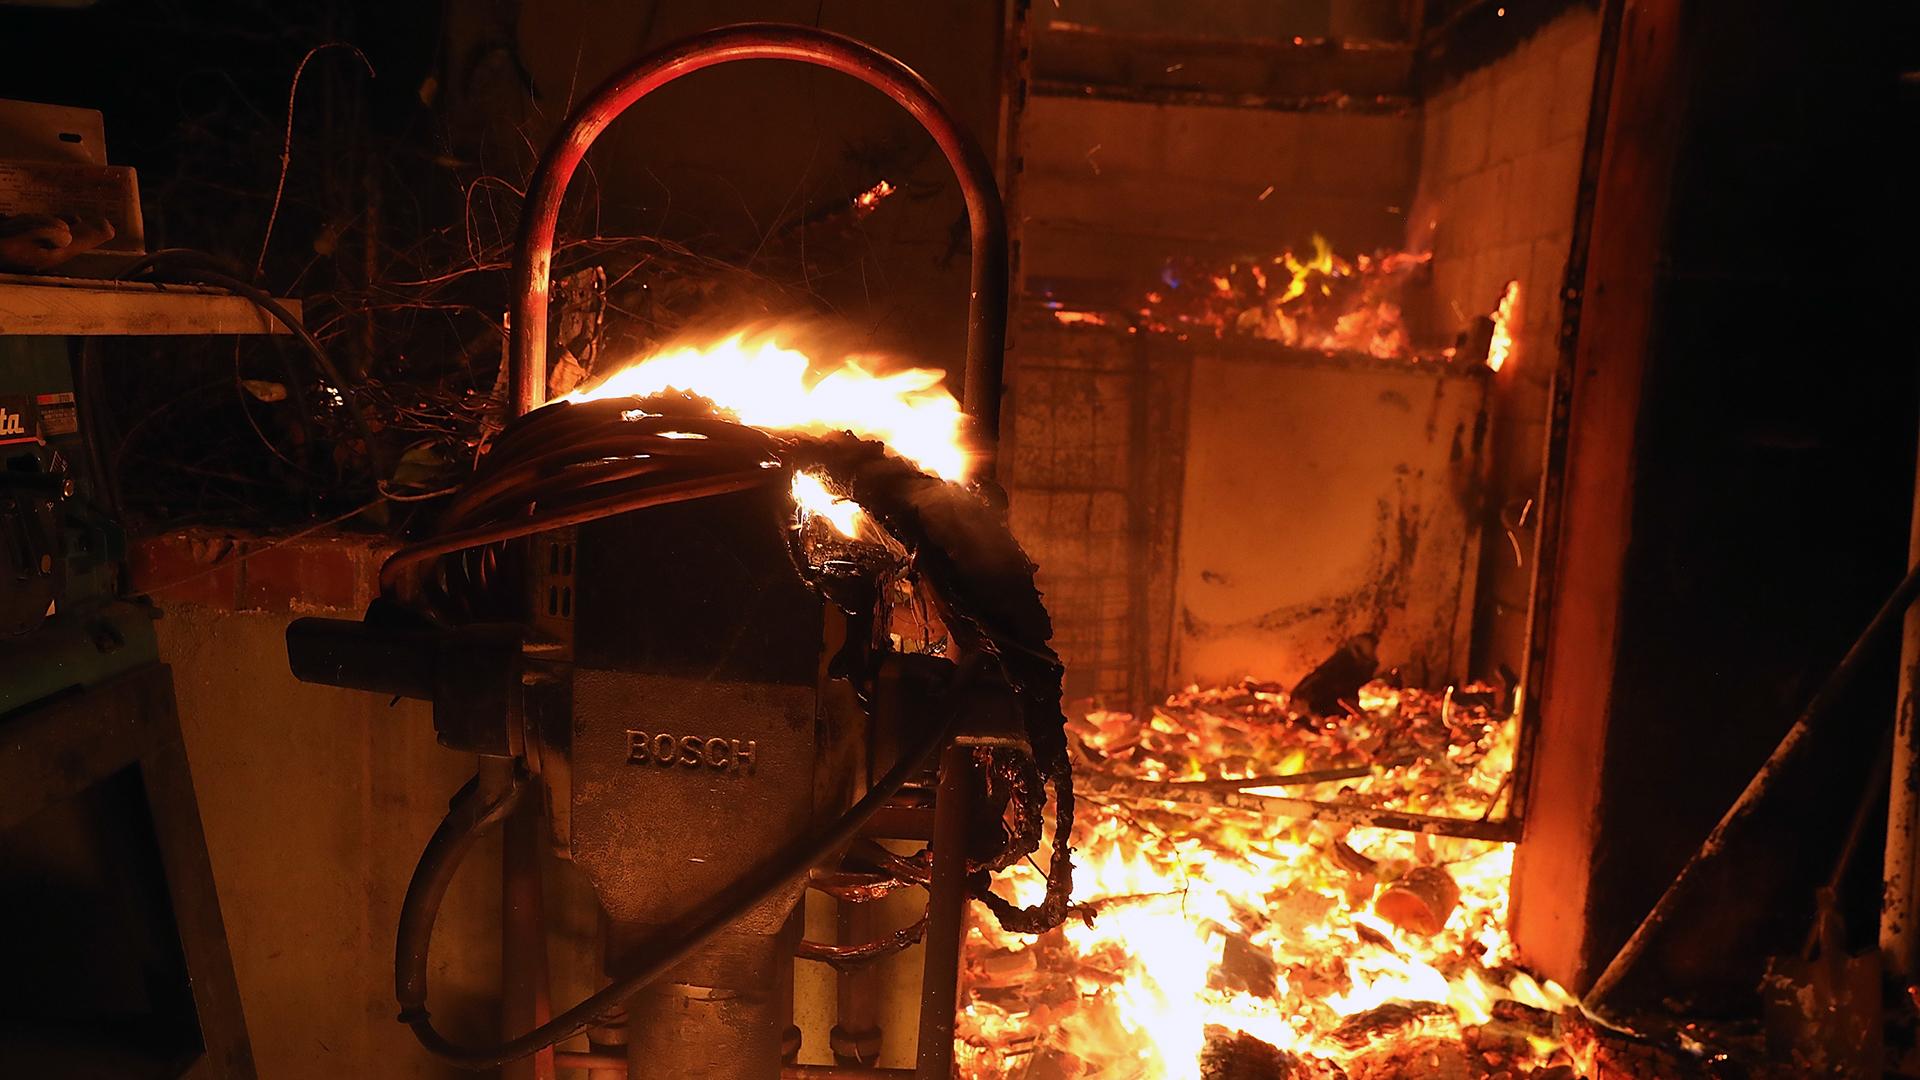 Thomas Fire in California Dec 7 home in flames-159532.jpg19725731